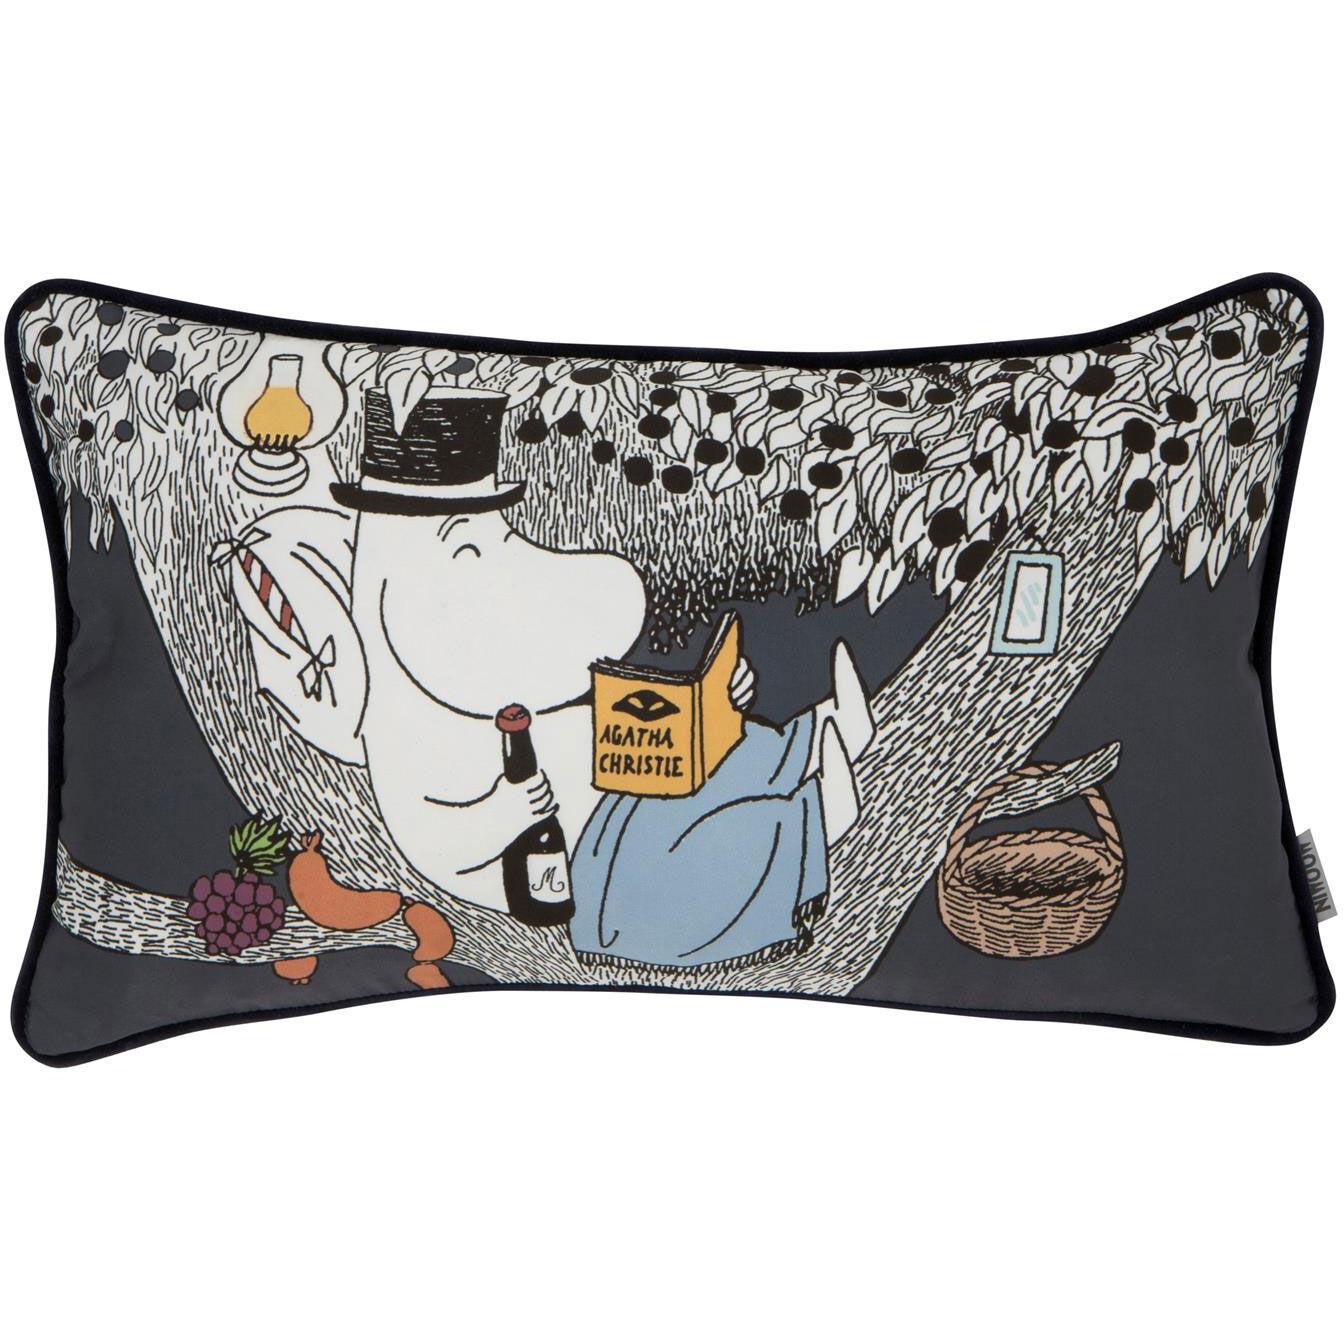 Moomin Moomin Dad Cushion Cover, 30x50 cm